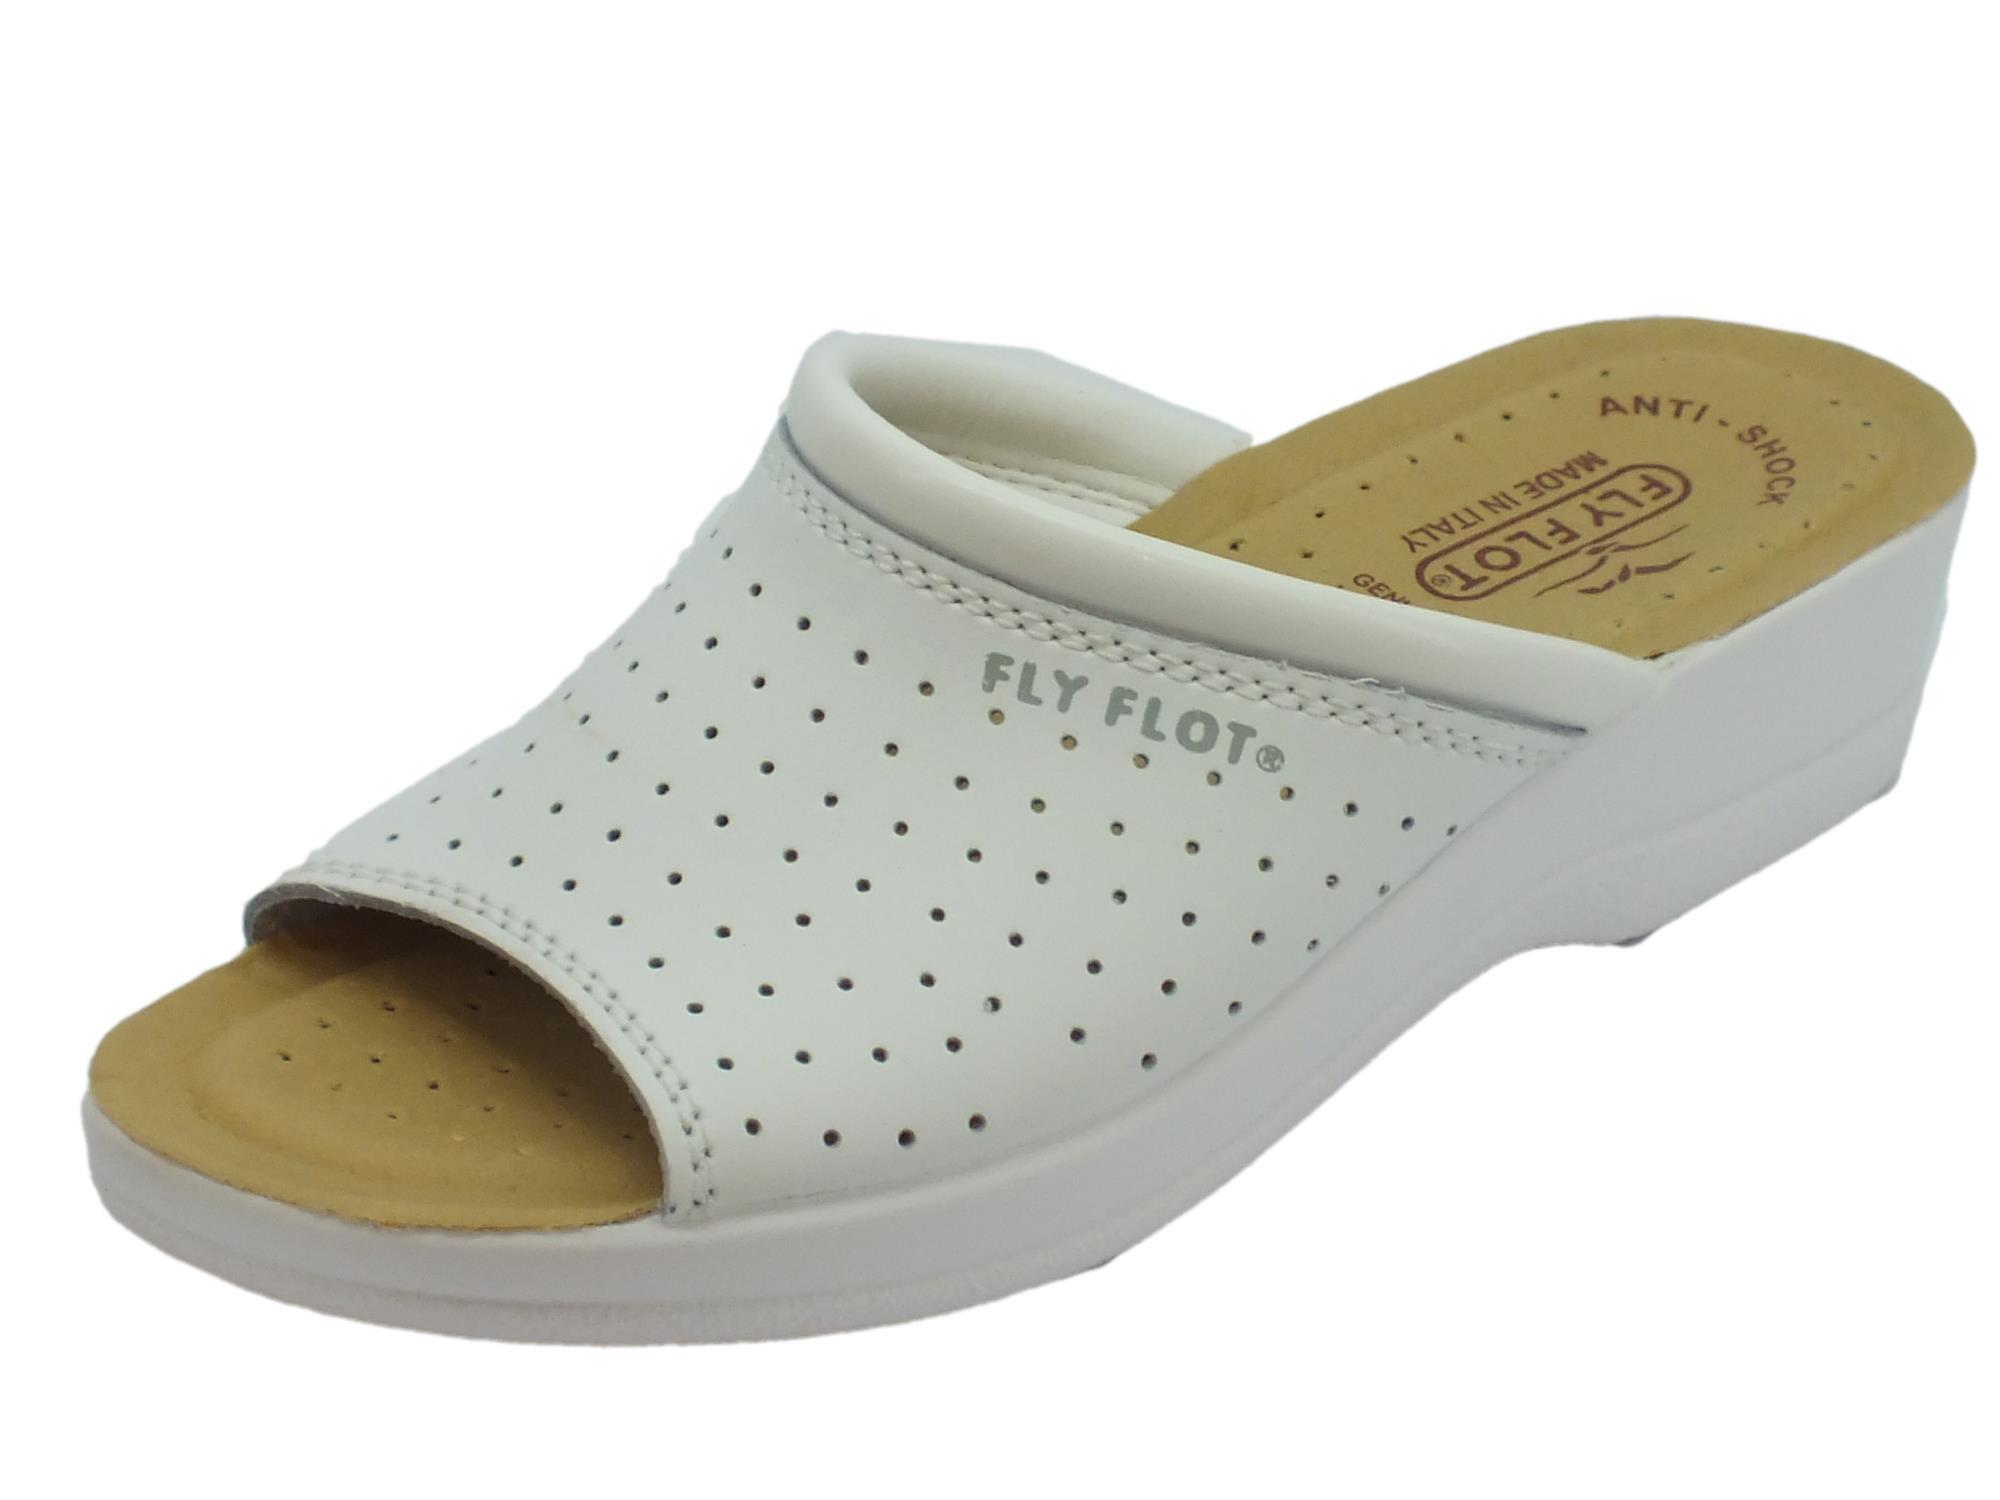 Pantofole spuntate FlyFlot in ecopelle traforata bianca sottopiede pelle  antishock f927040fc0a